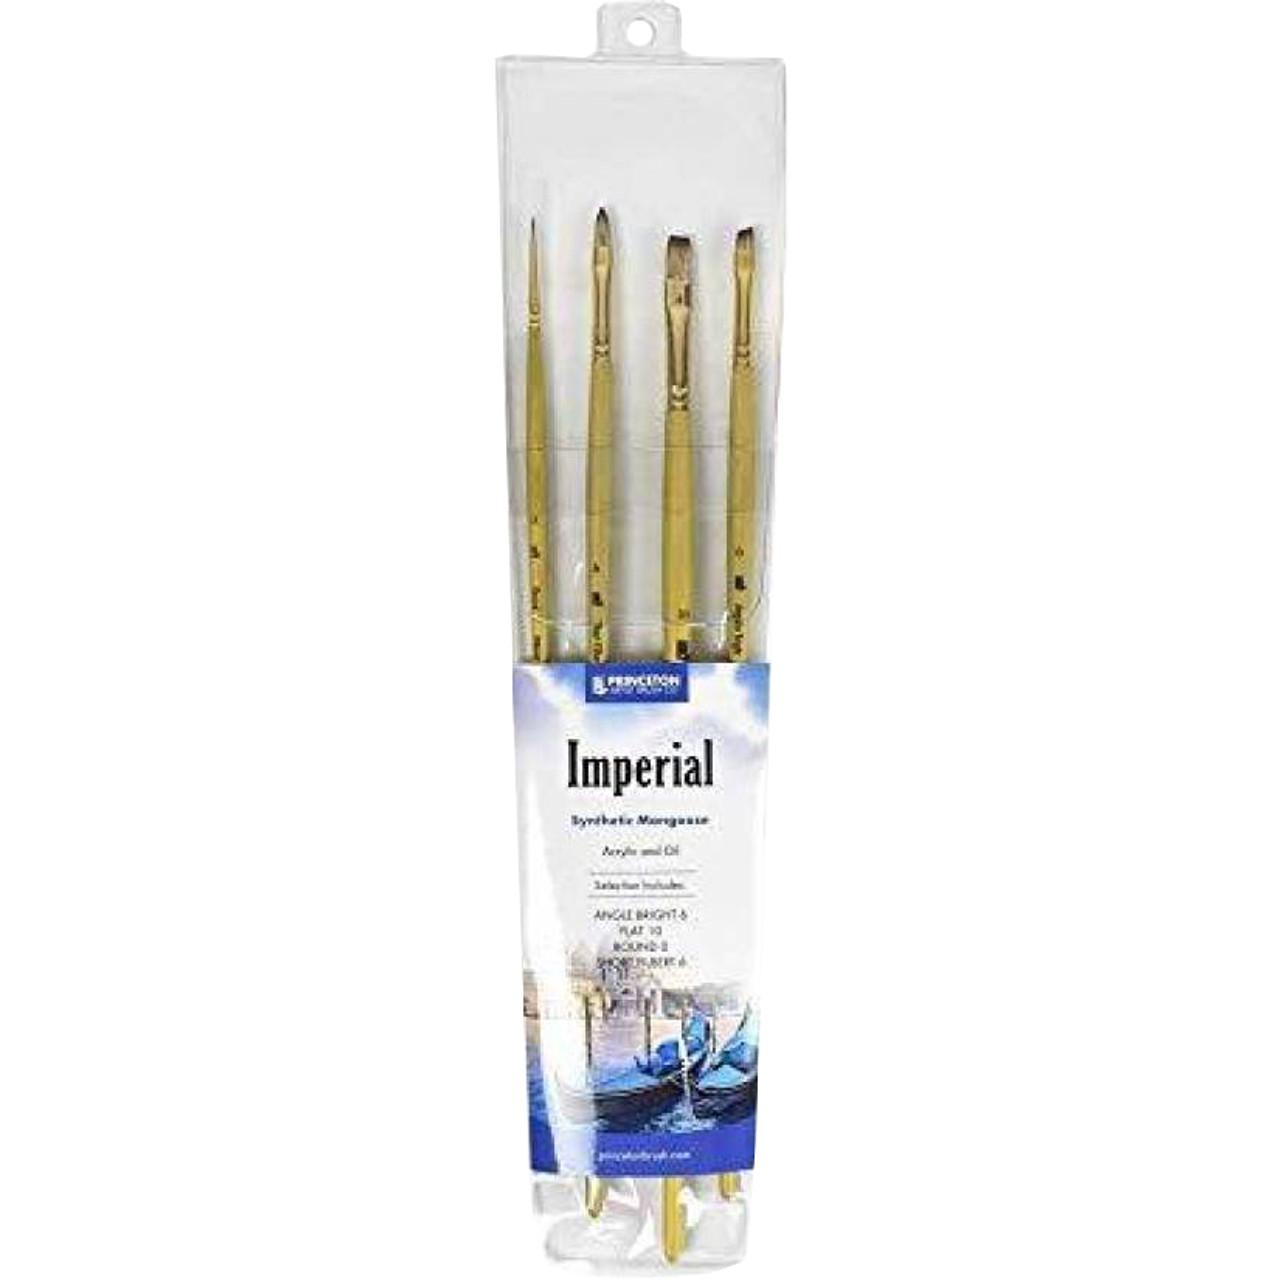 Princeton Imperial Professional 4-brush Set